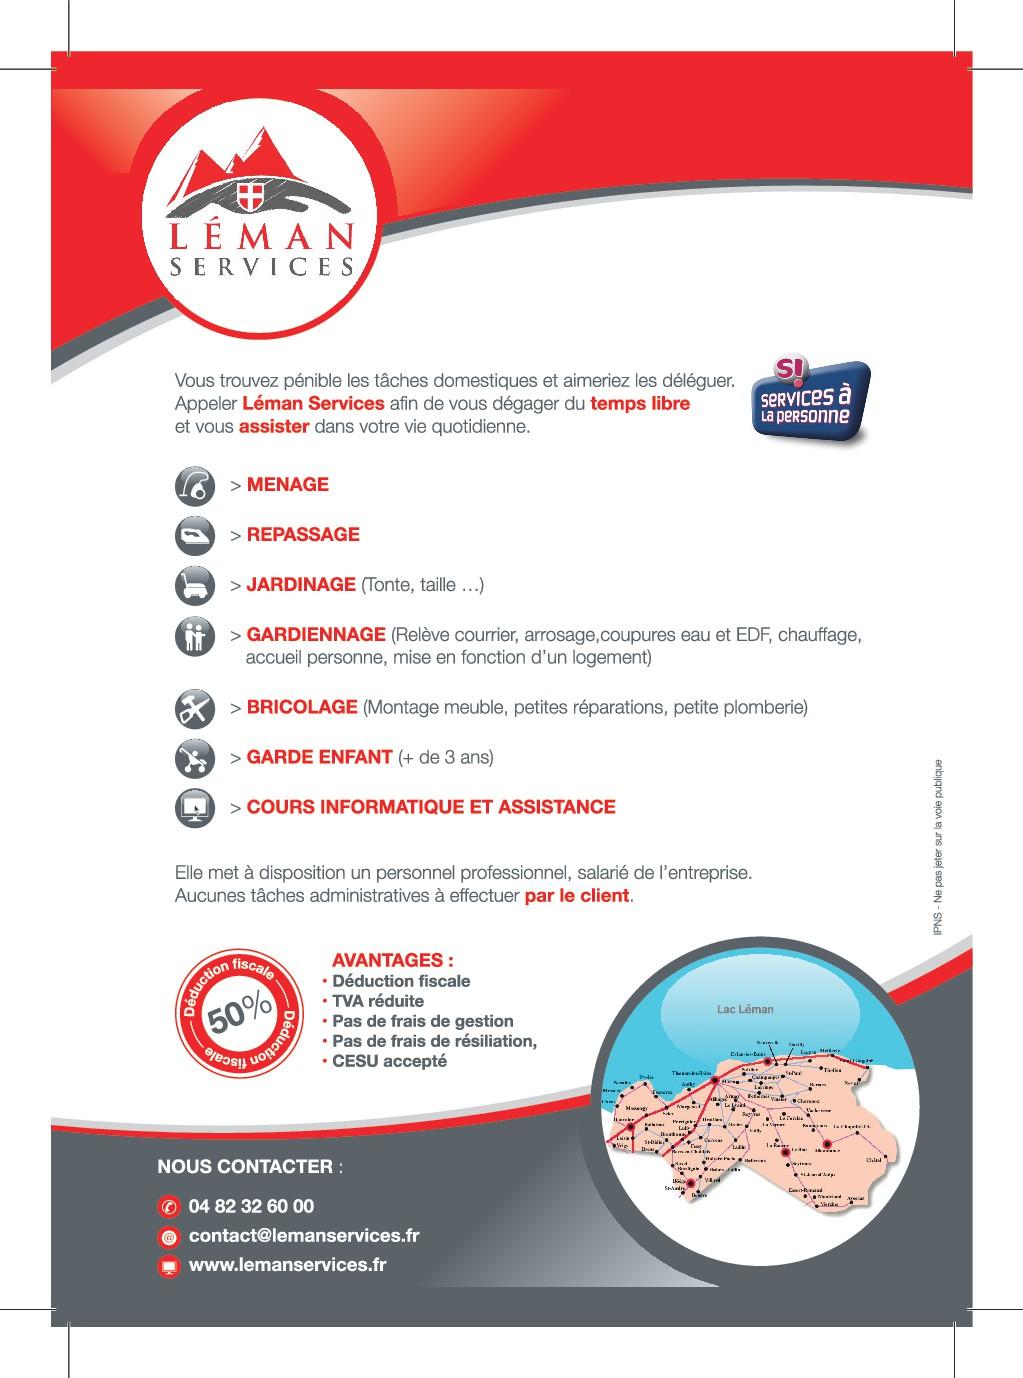 leman services  flyer